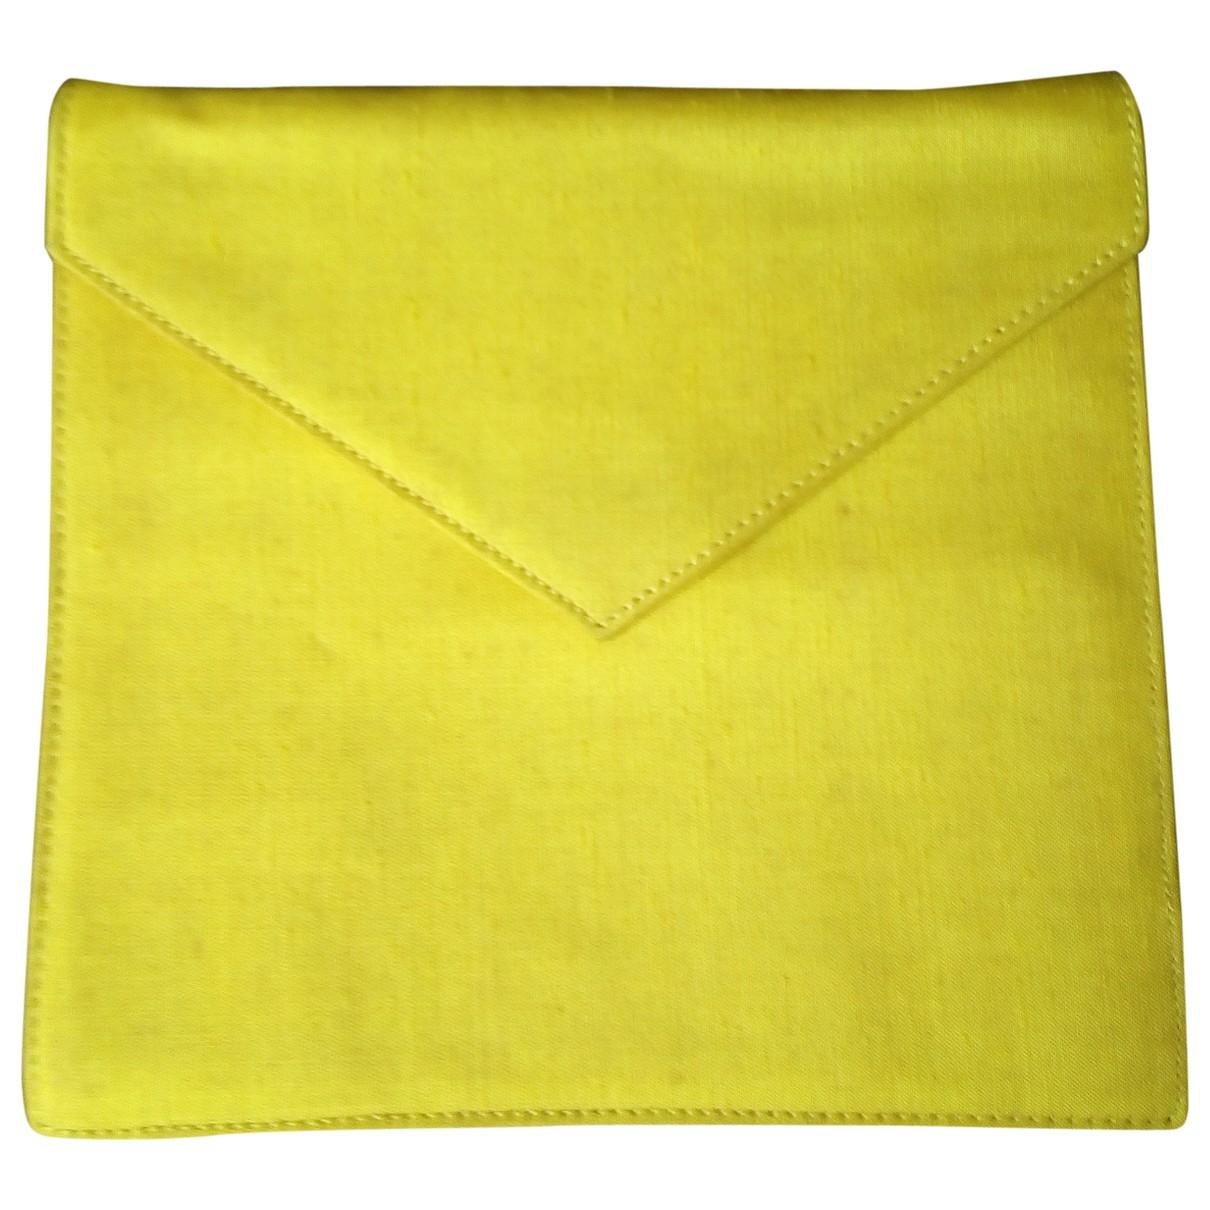 Gianni Versace \N Clutch in  Gelb Seide